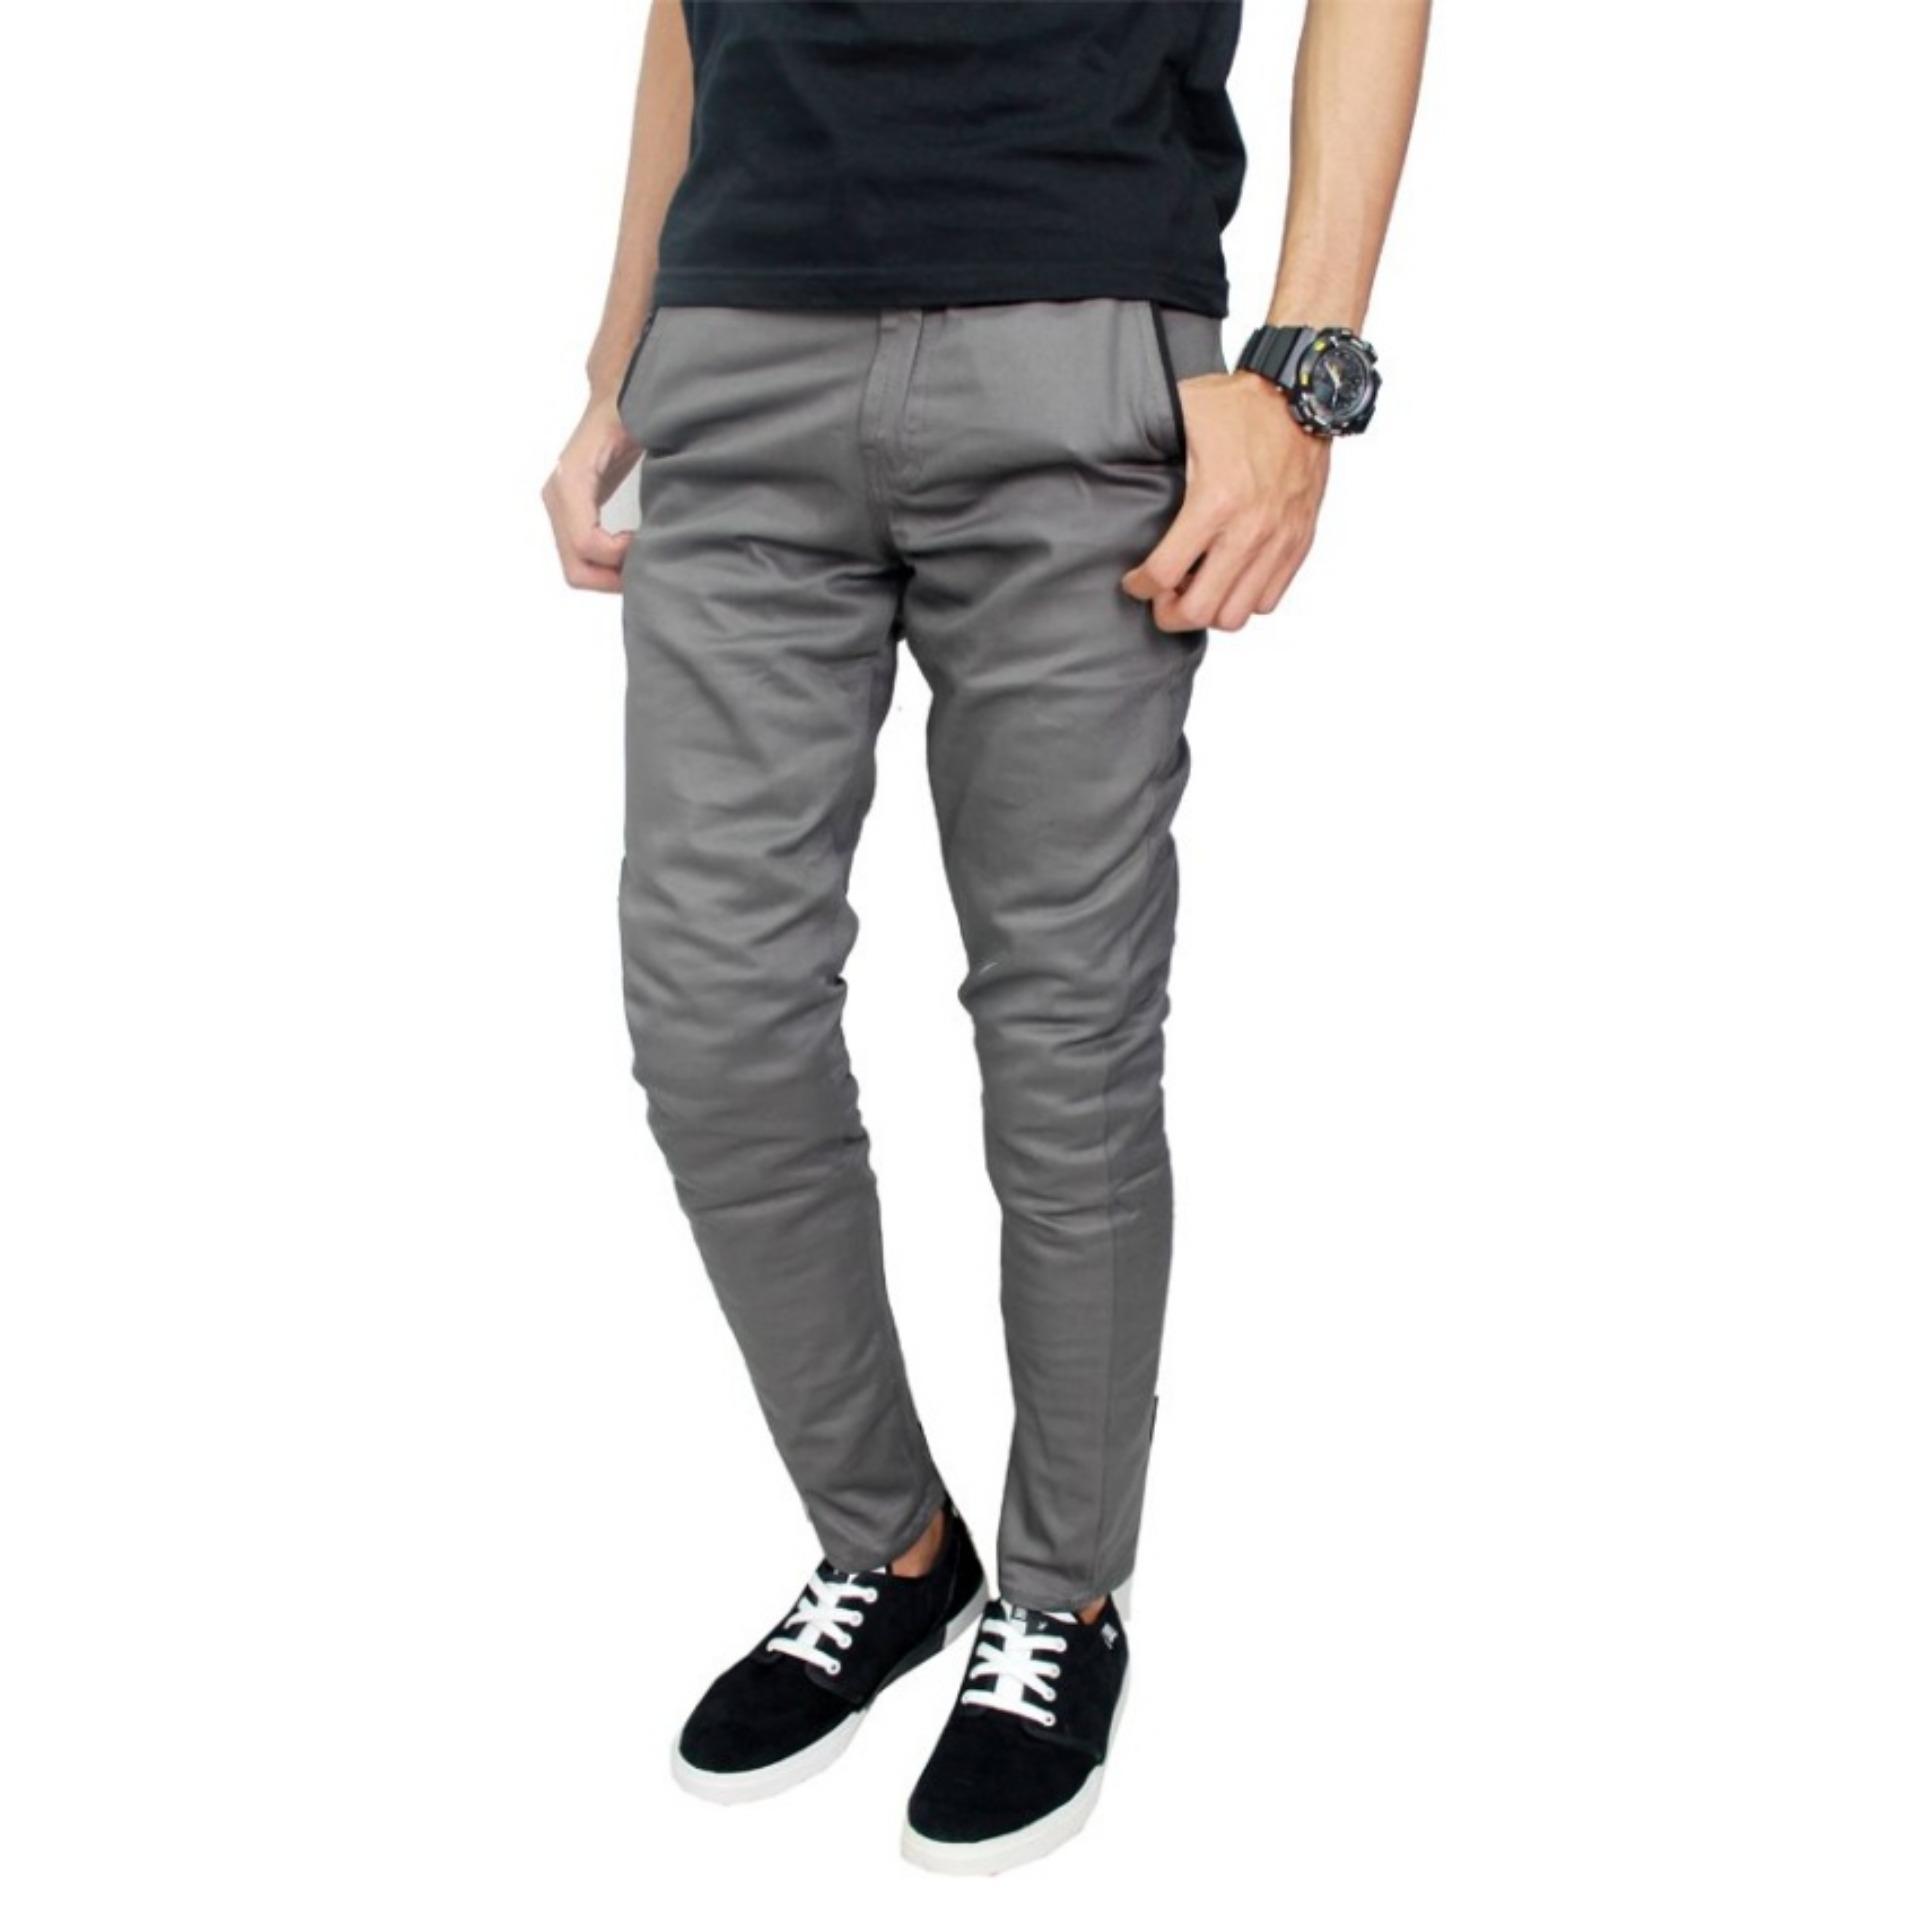 Pieter Jackson Chino Slim Fit Pants Hitam Panjang - Update Daftar ... 8db2bdd9a0